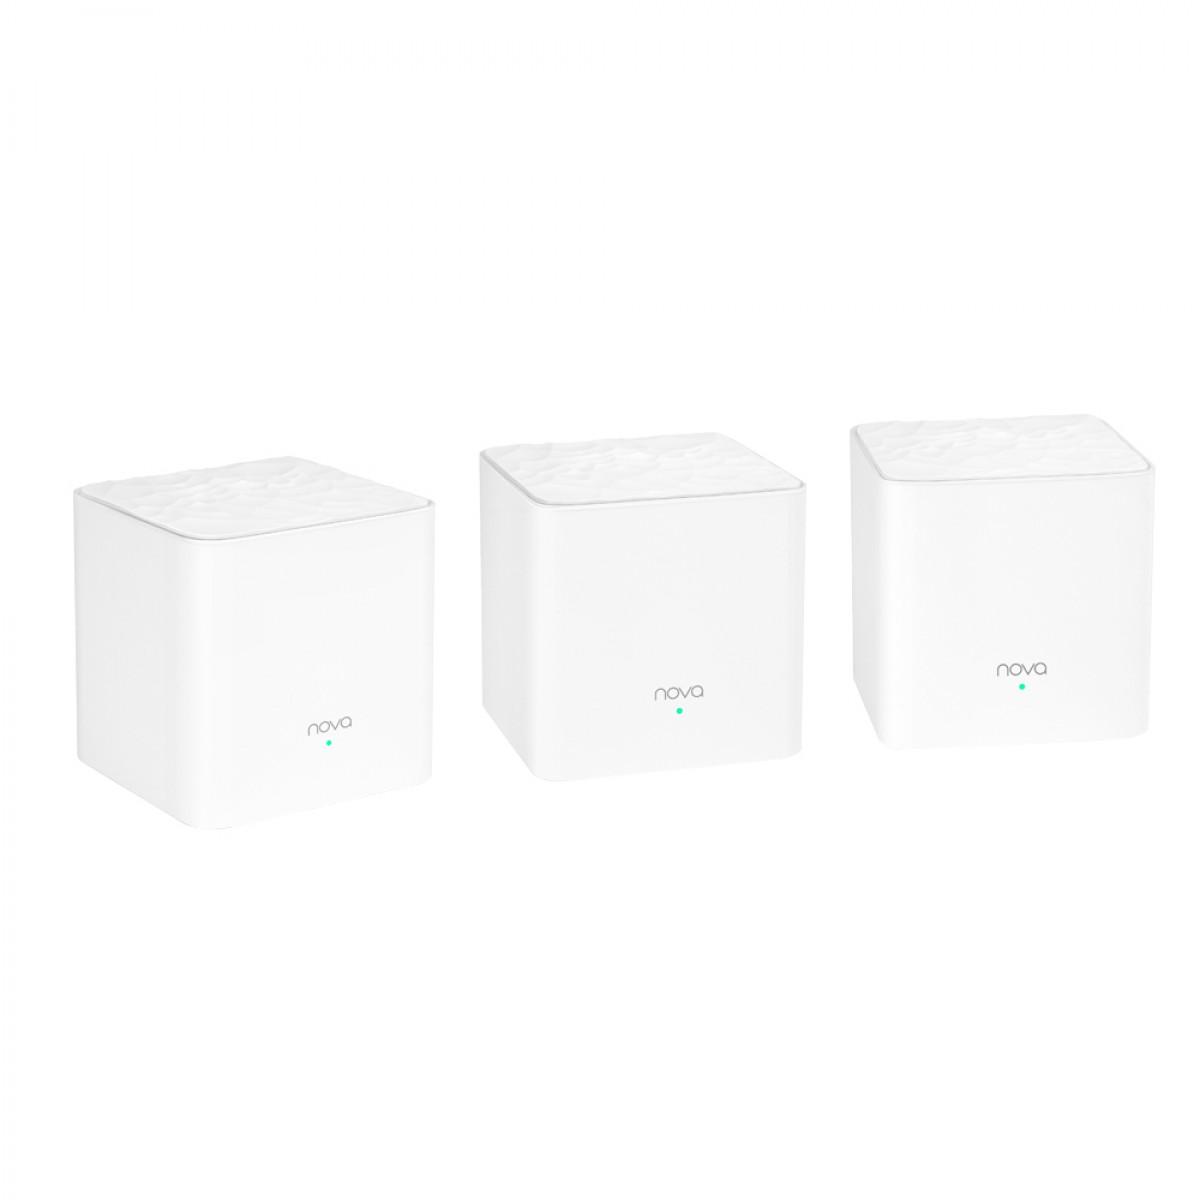 Tenda MW3(3-Pack) AC1200 Whole Home Mesh WiFi System - VEVE